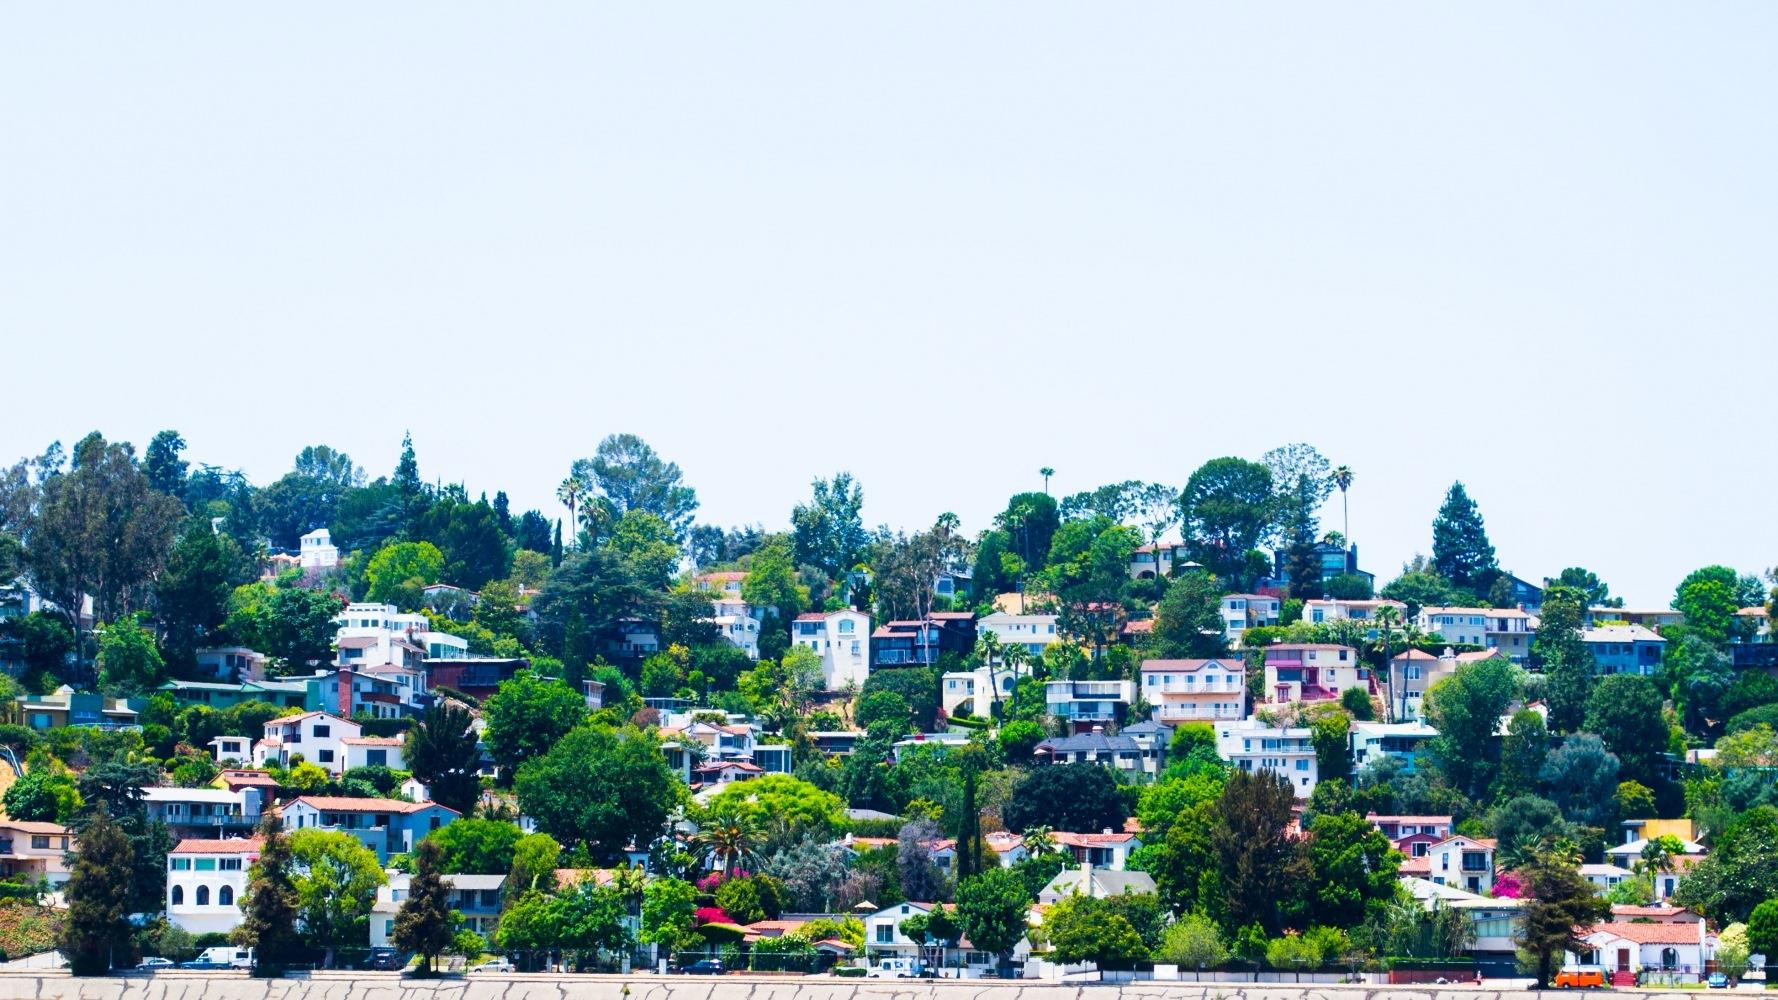 Silver Lake Neighborhood in Los Angeles by friendlylocalguides